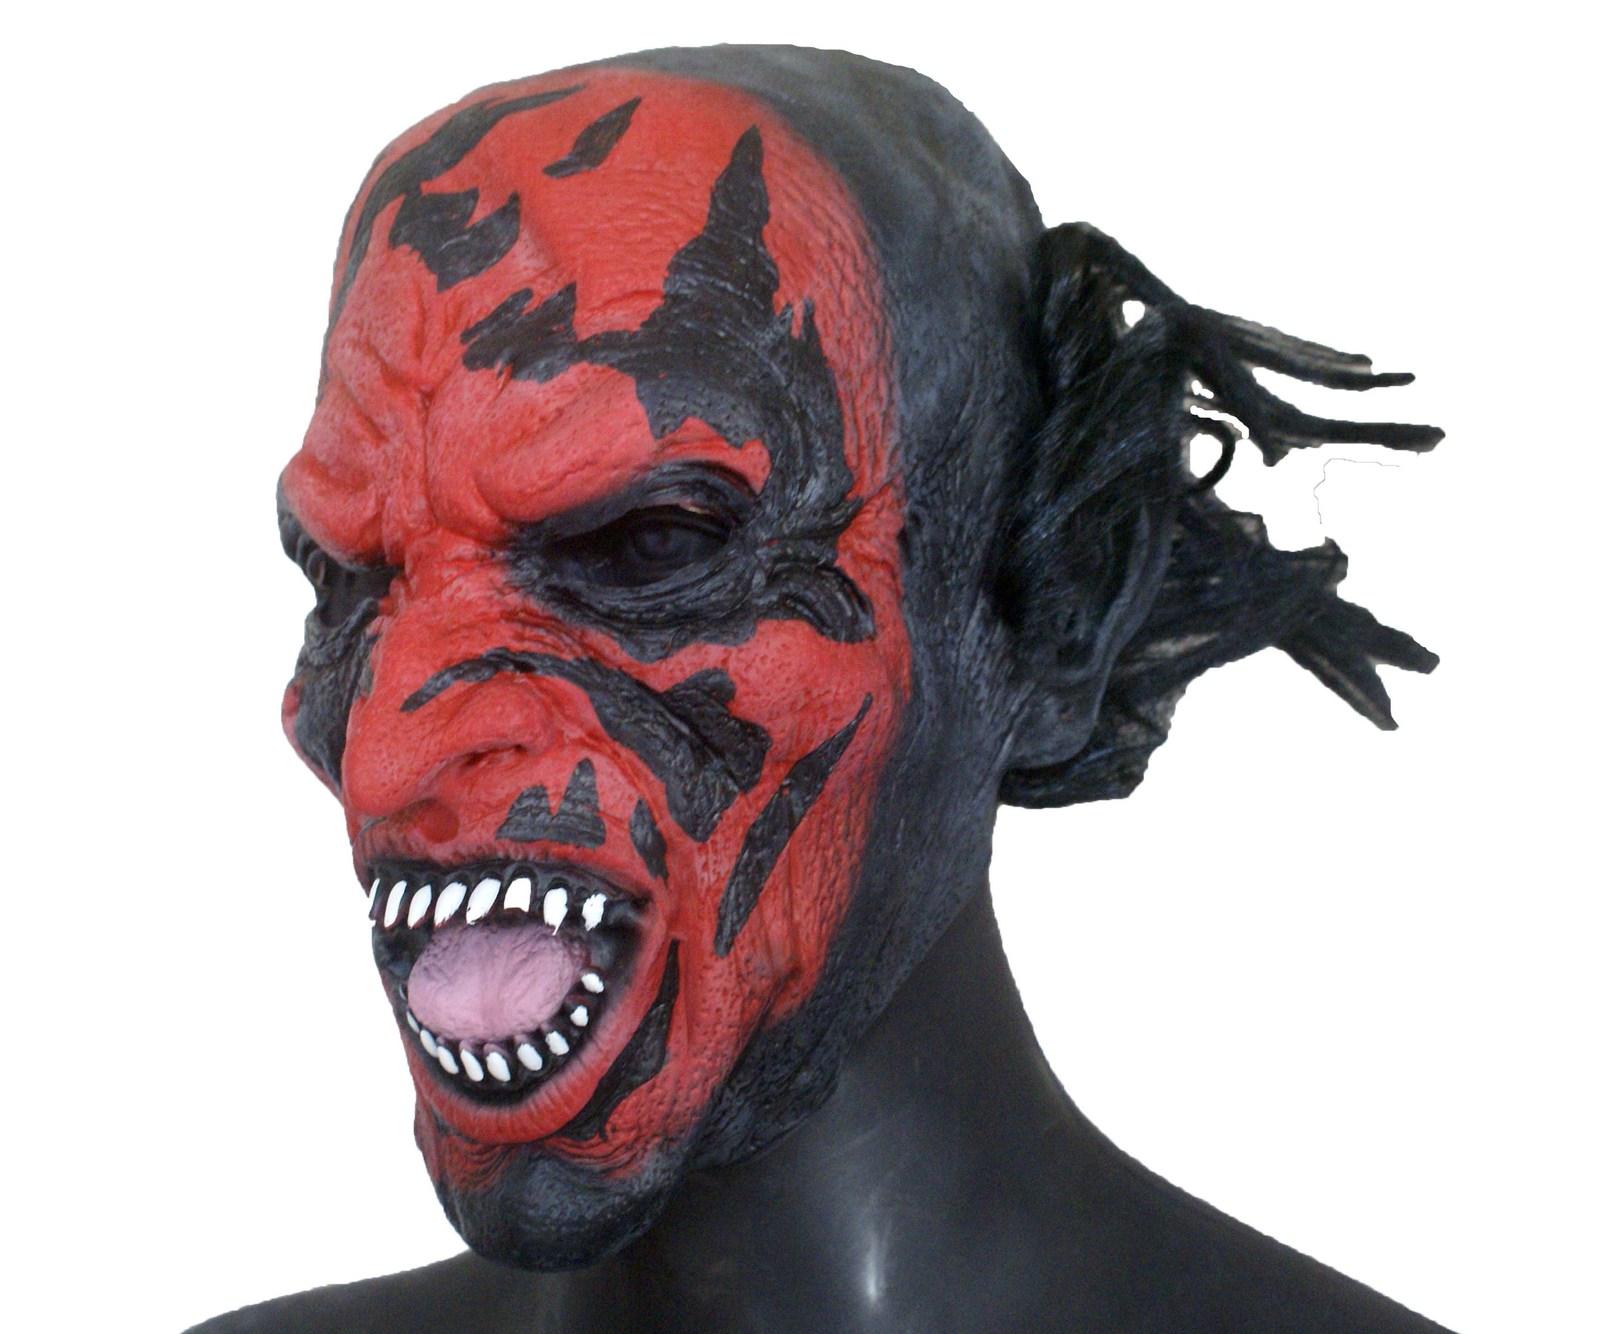 ... Insidious Demon Mask fancy dress DVD Cunjuring Bane Halloween Costume Cosplay ...  sc 1 st  Bonanza & Insidious Demon Mask fancy dress DVD and 50 similar items